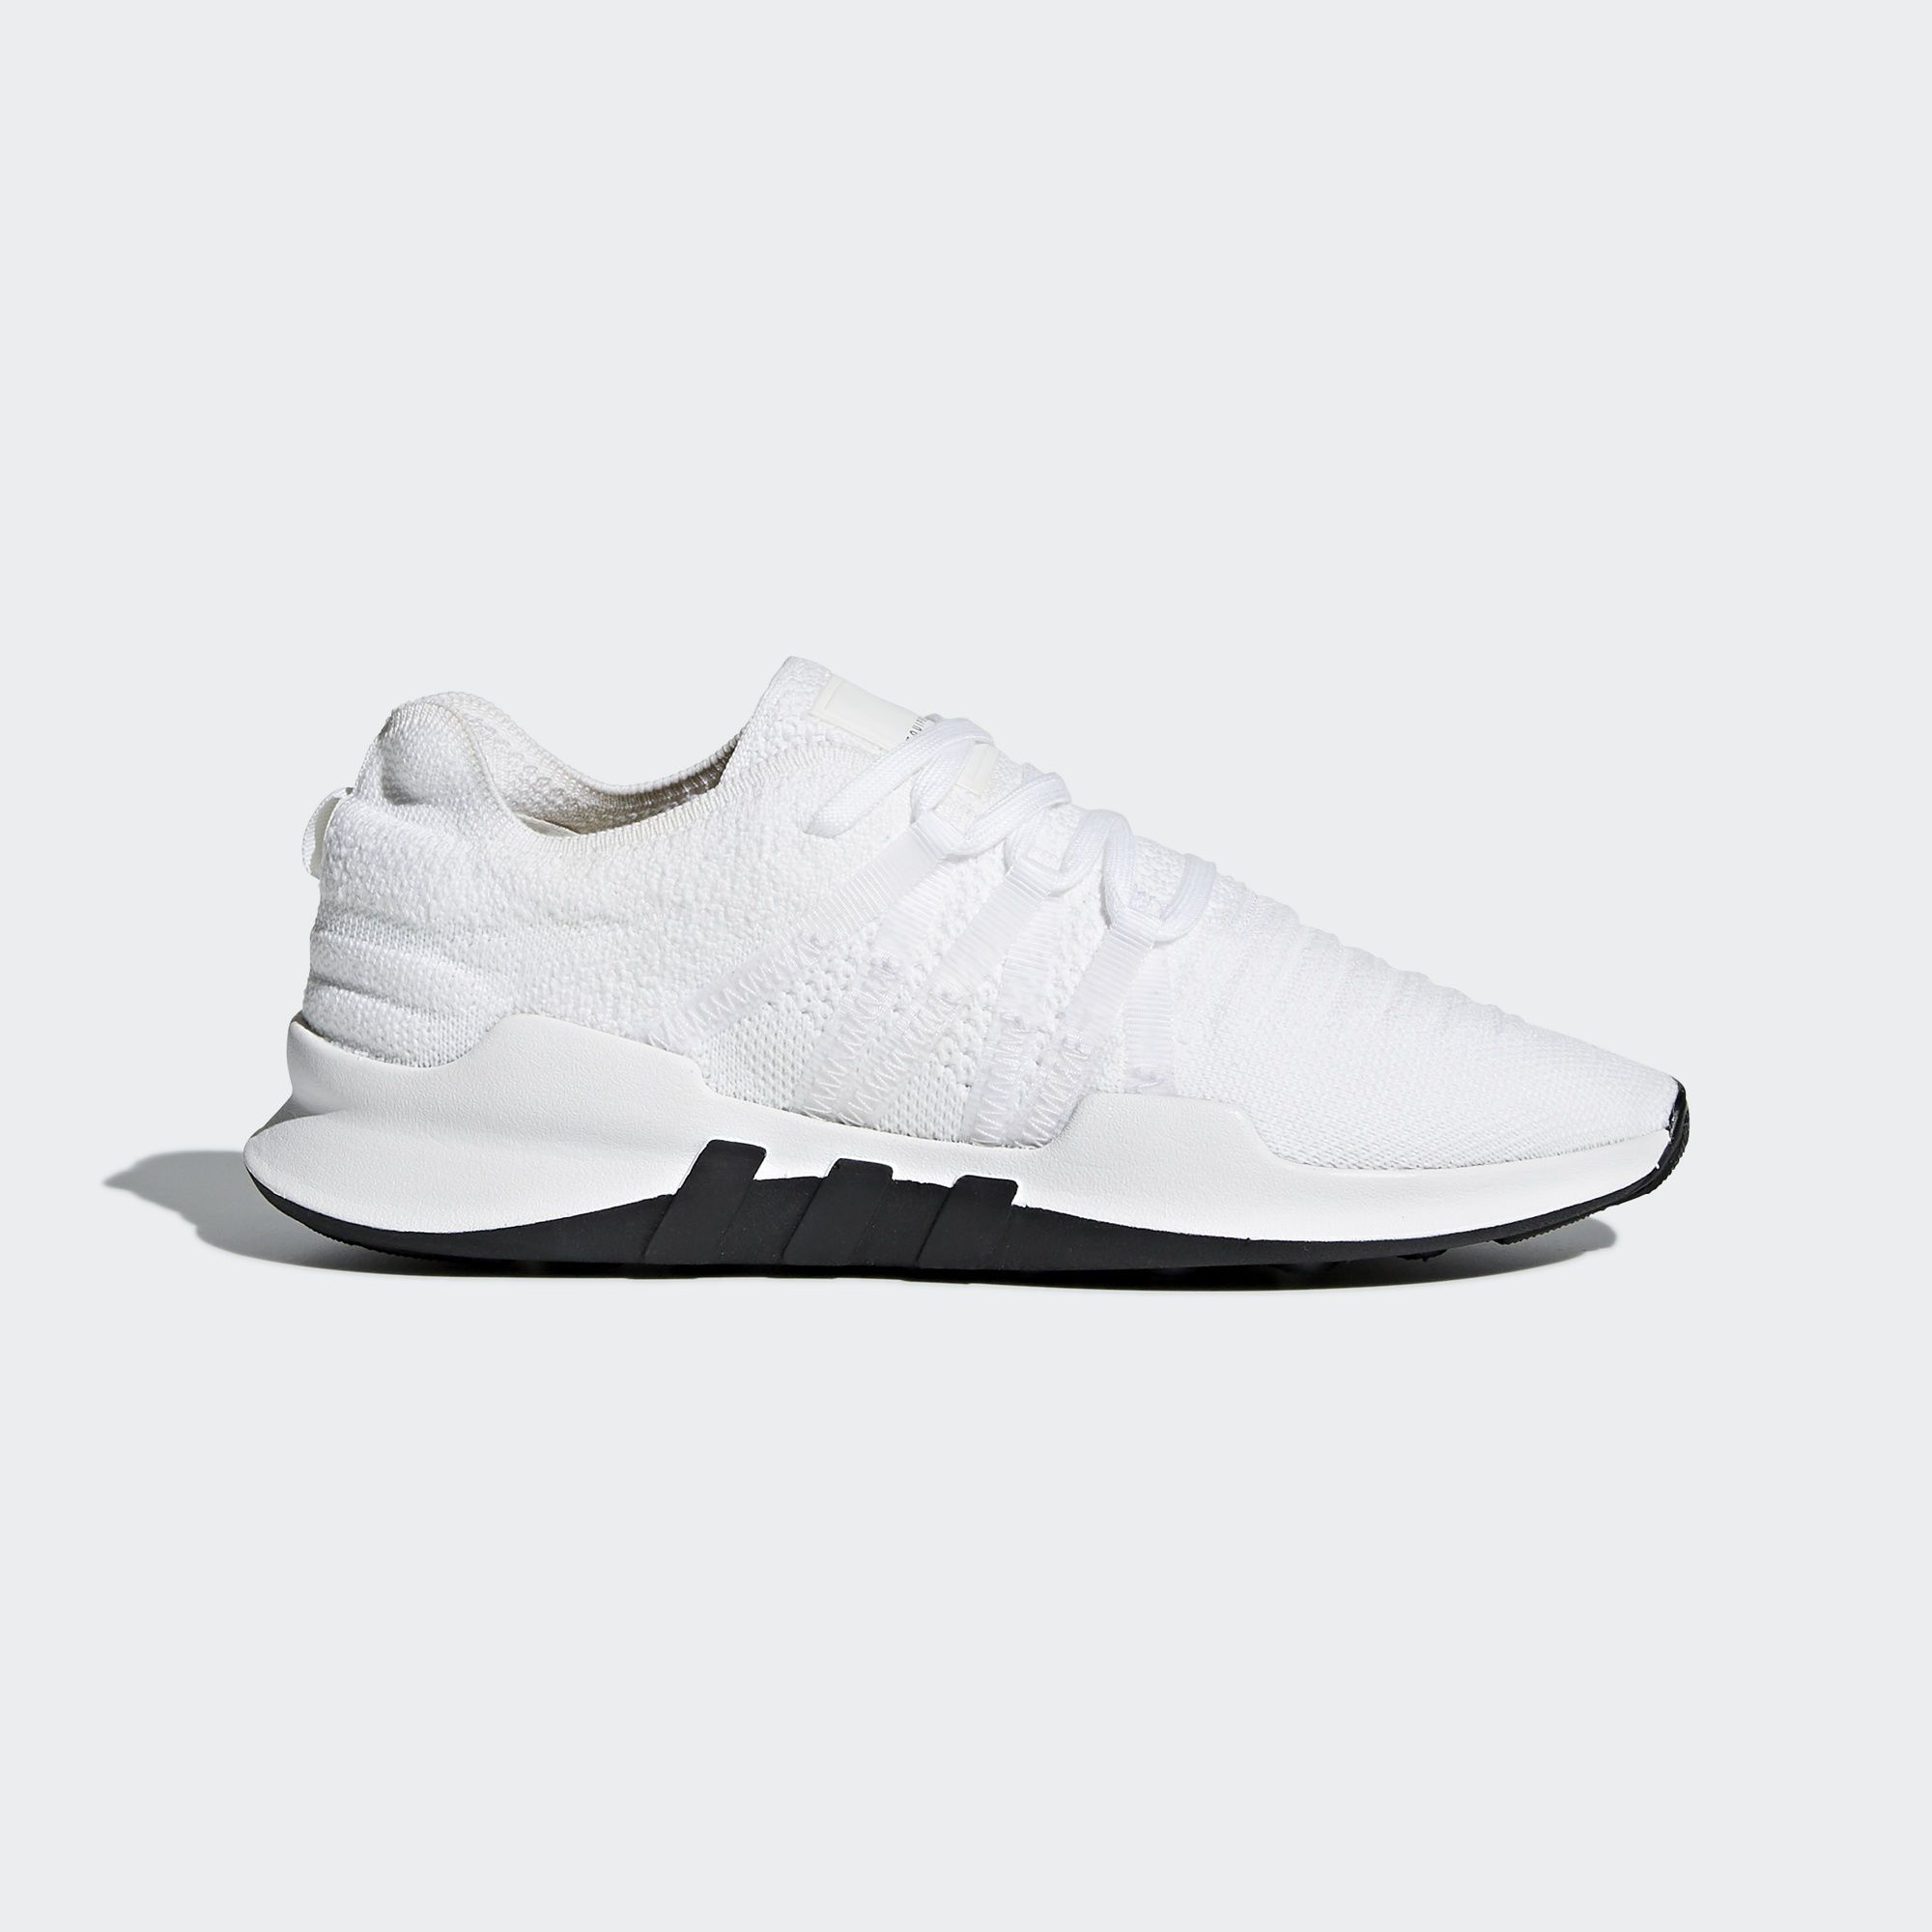 Patológico Deliberar Desarrollar  adidas EQT ADV Racing Shoes - White | adidas US | Support shoes, Shoes, Racing  shoes